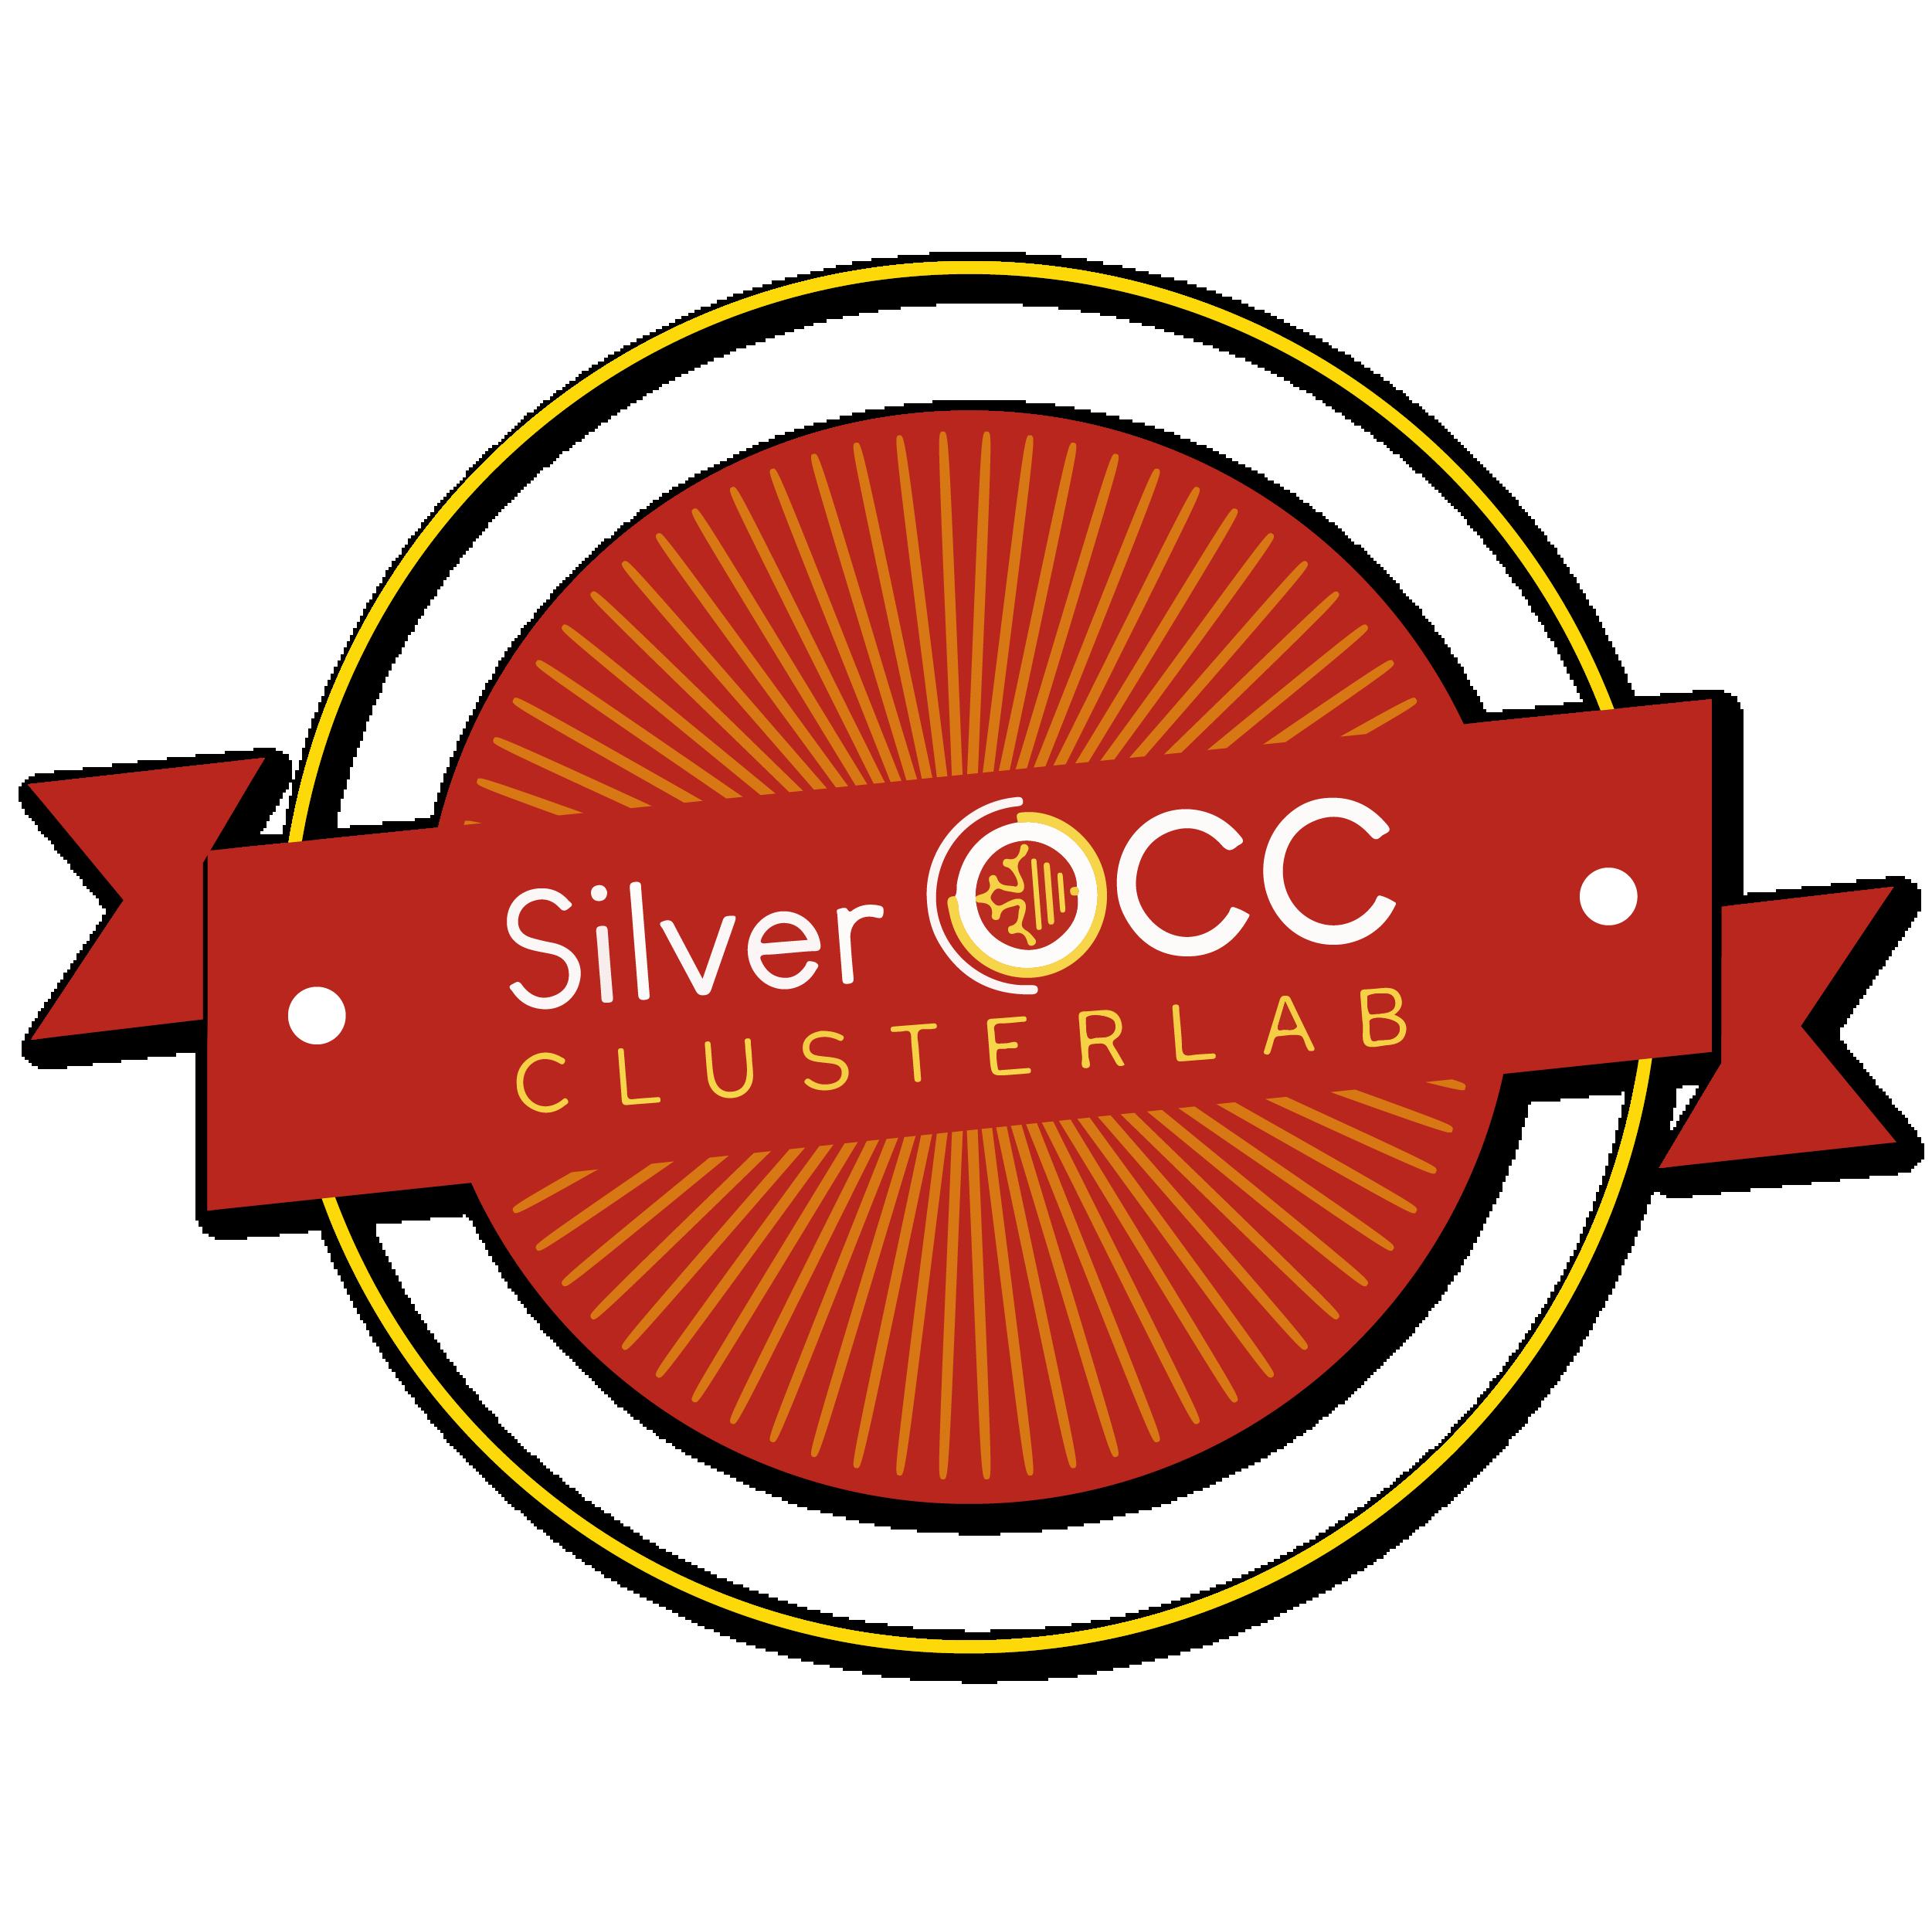 logo cluster senior Silver Occ Lab